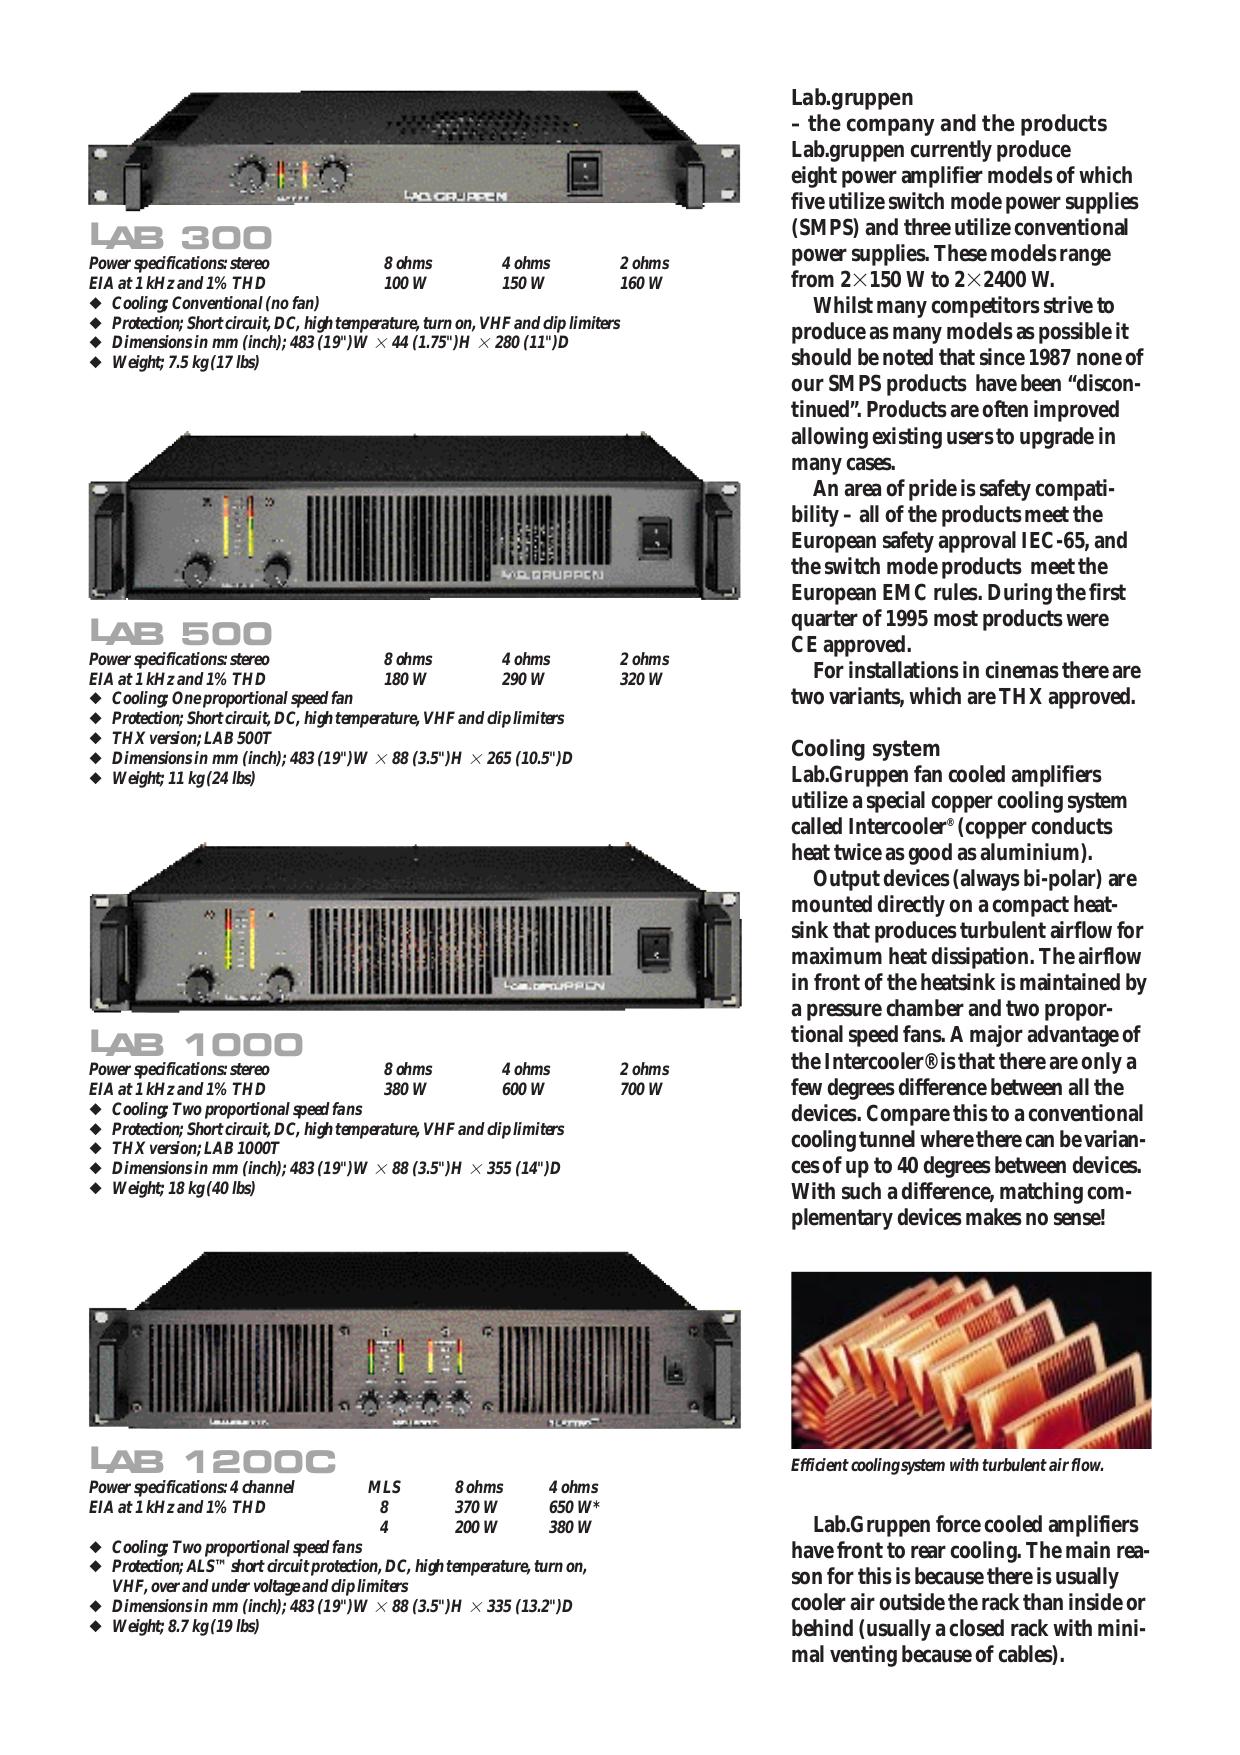 pdf for Lab.gruppen Amp LAB 500 manual